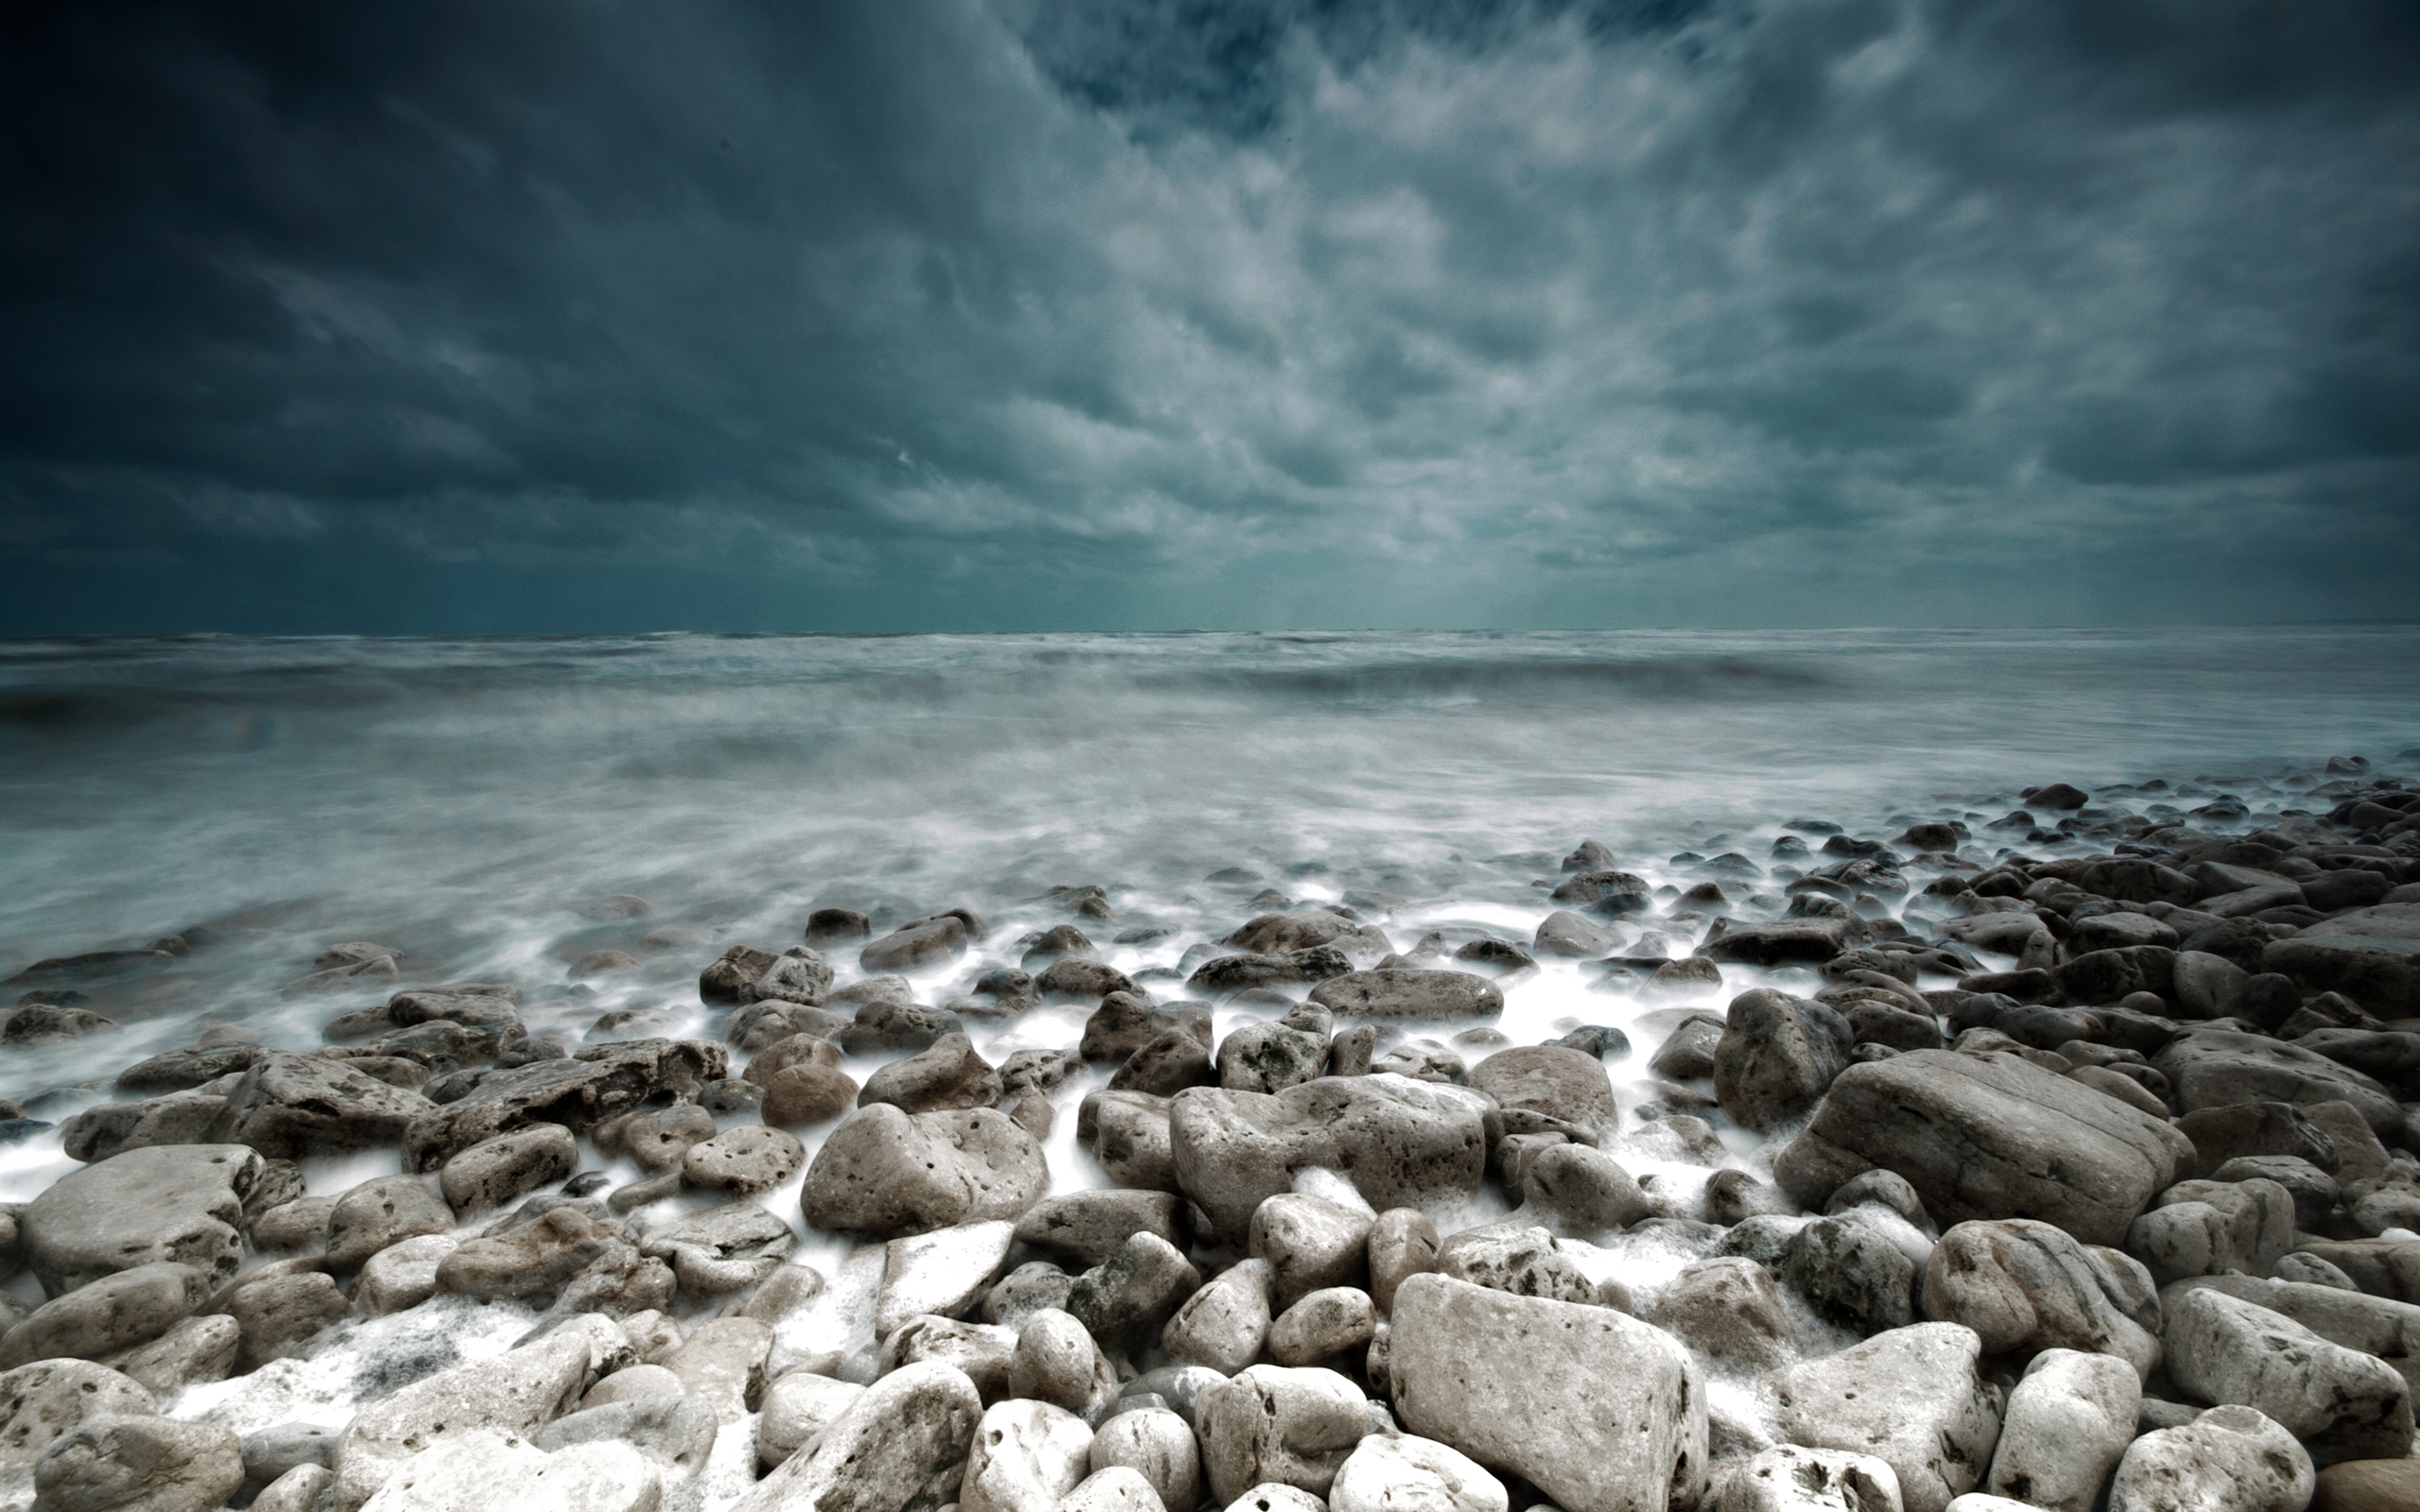 море перед бурей  № 3112527 бесплатно